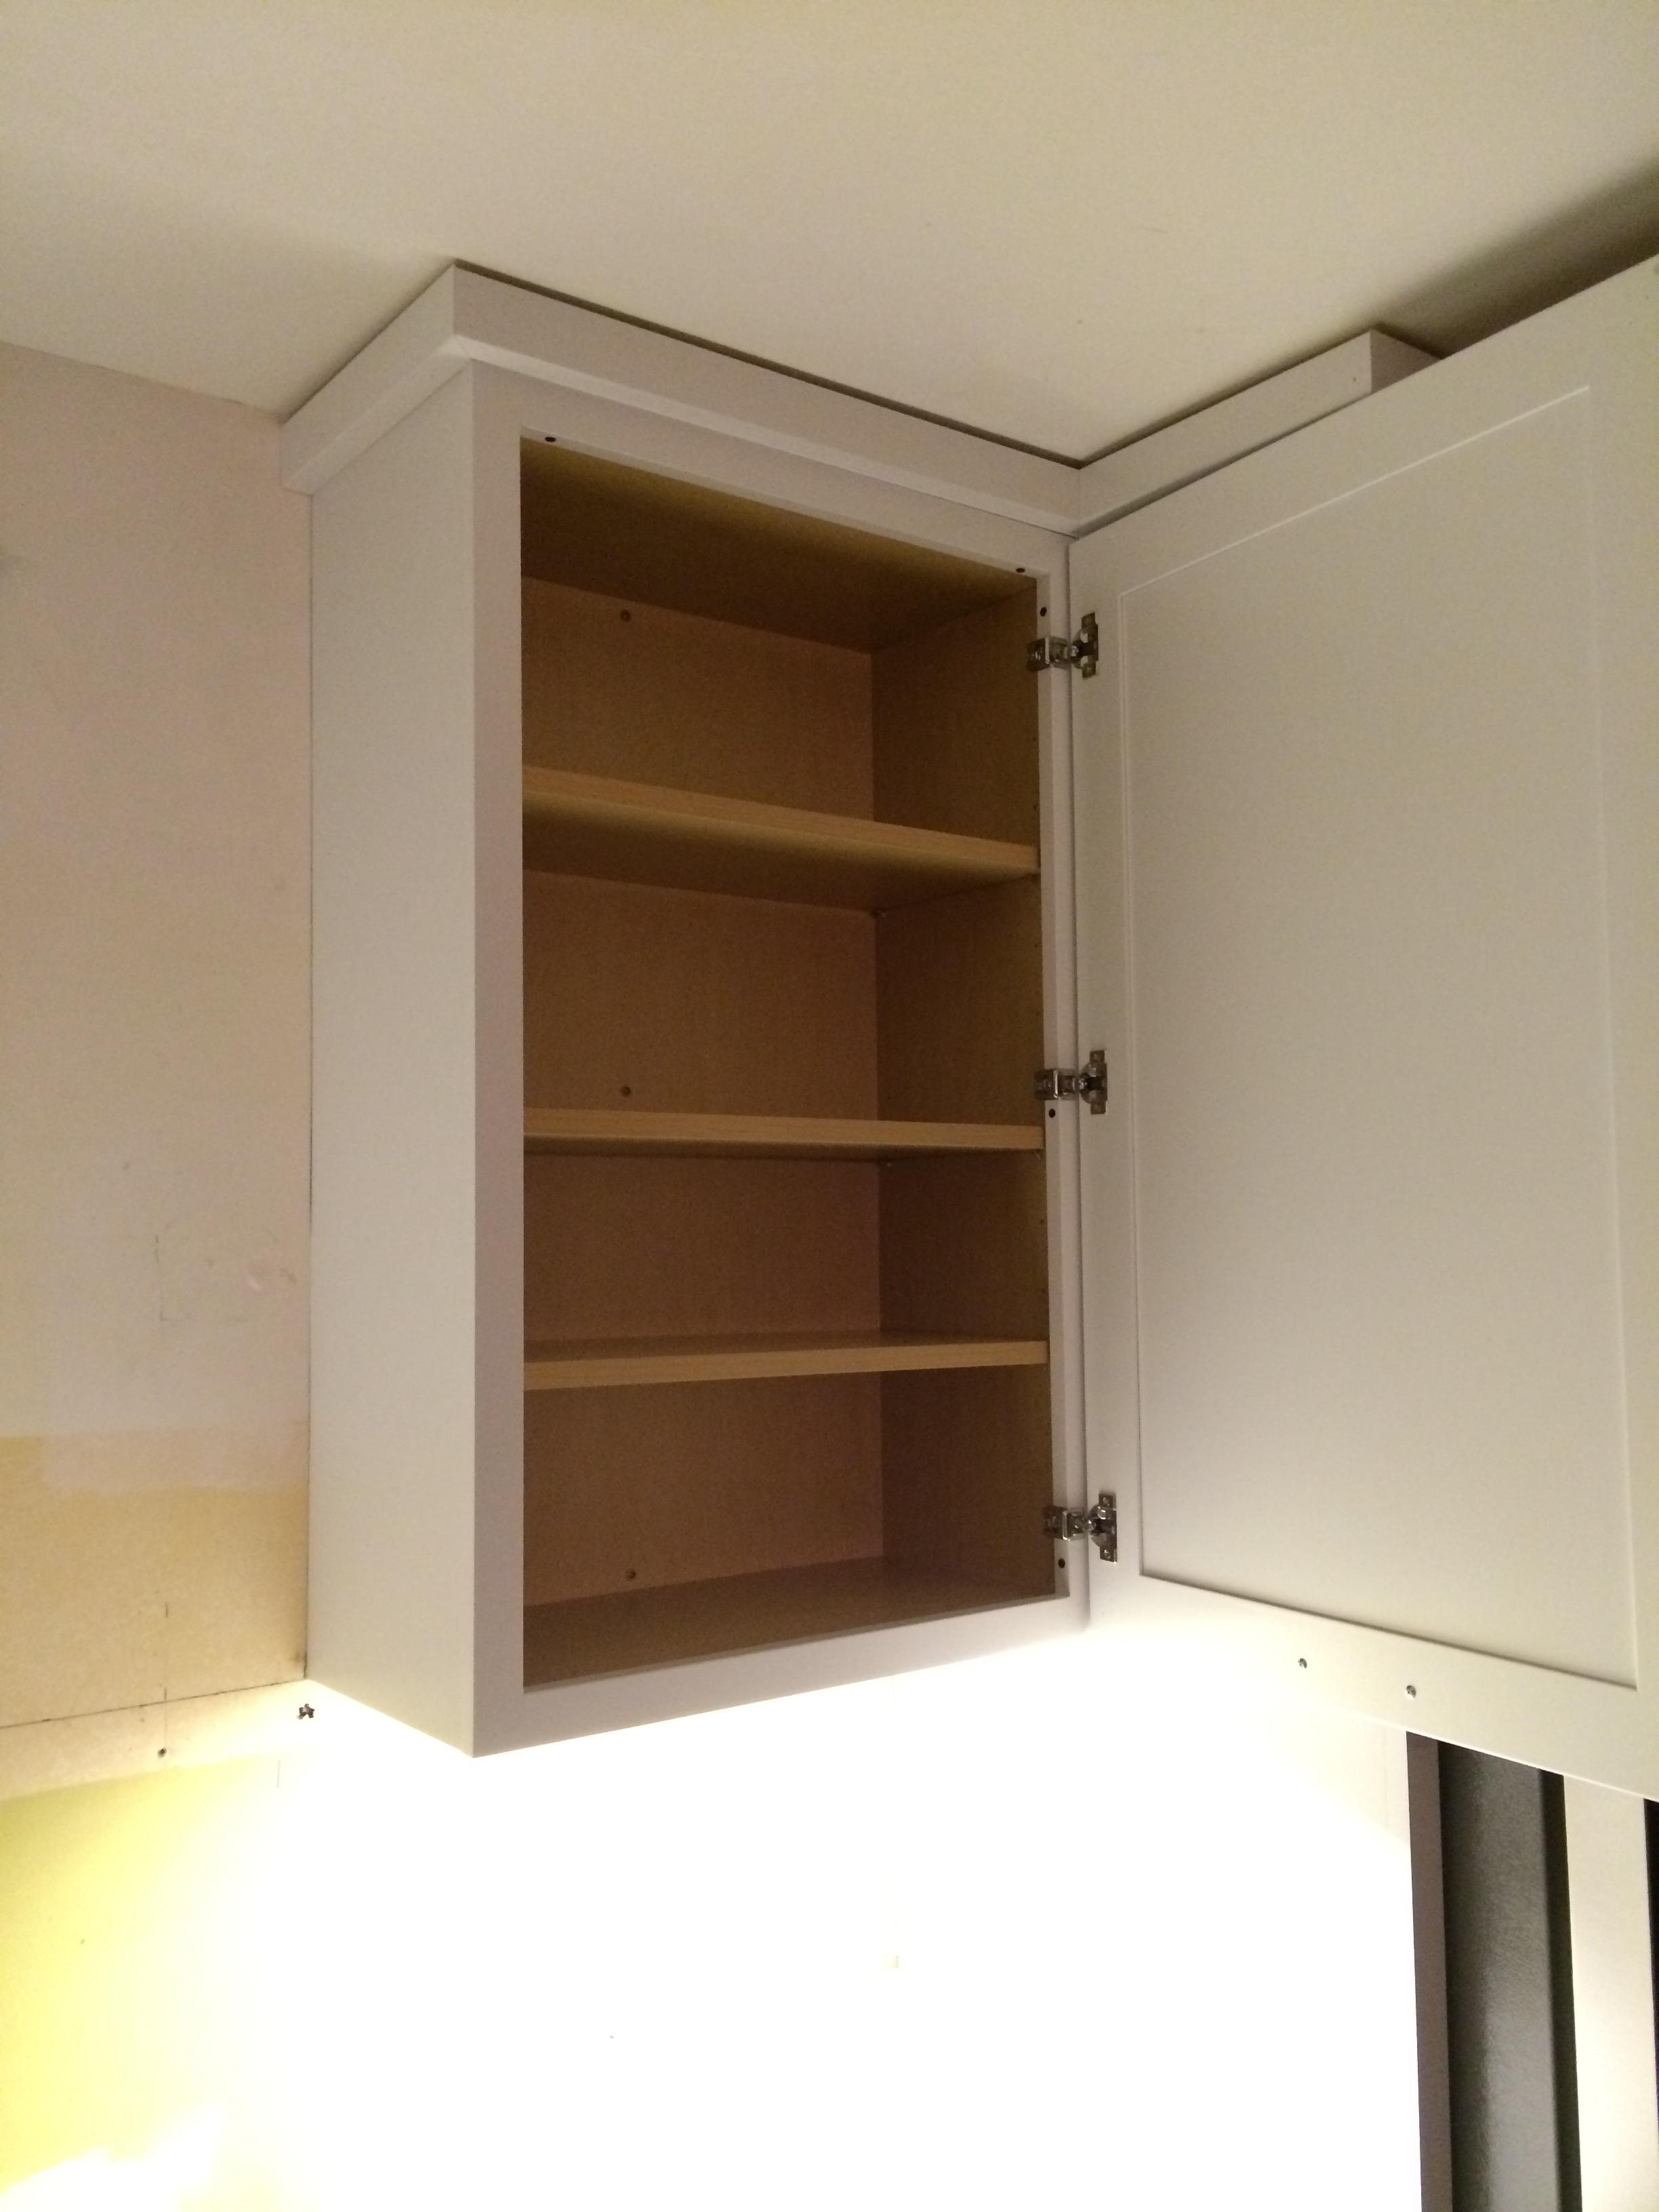 Kraftmaid Vanity Cabinets Kraftmaid Kitchen Cabinets Warranty Full Size Of Attractive